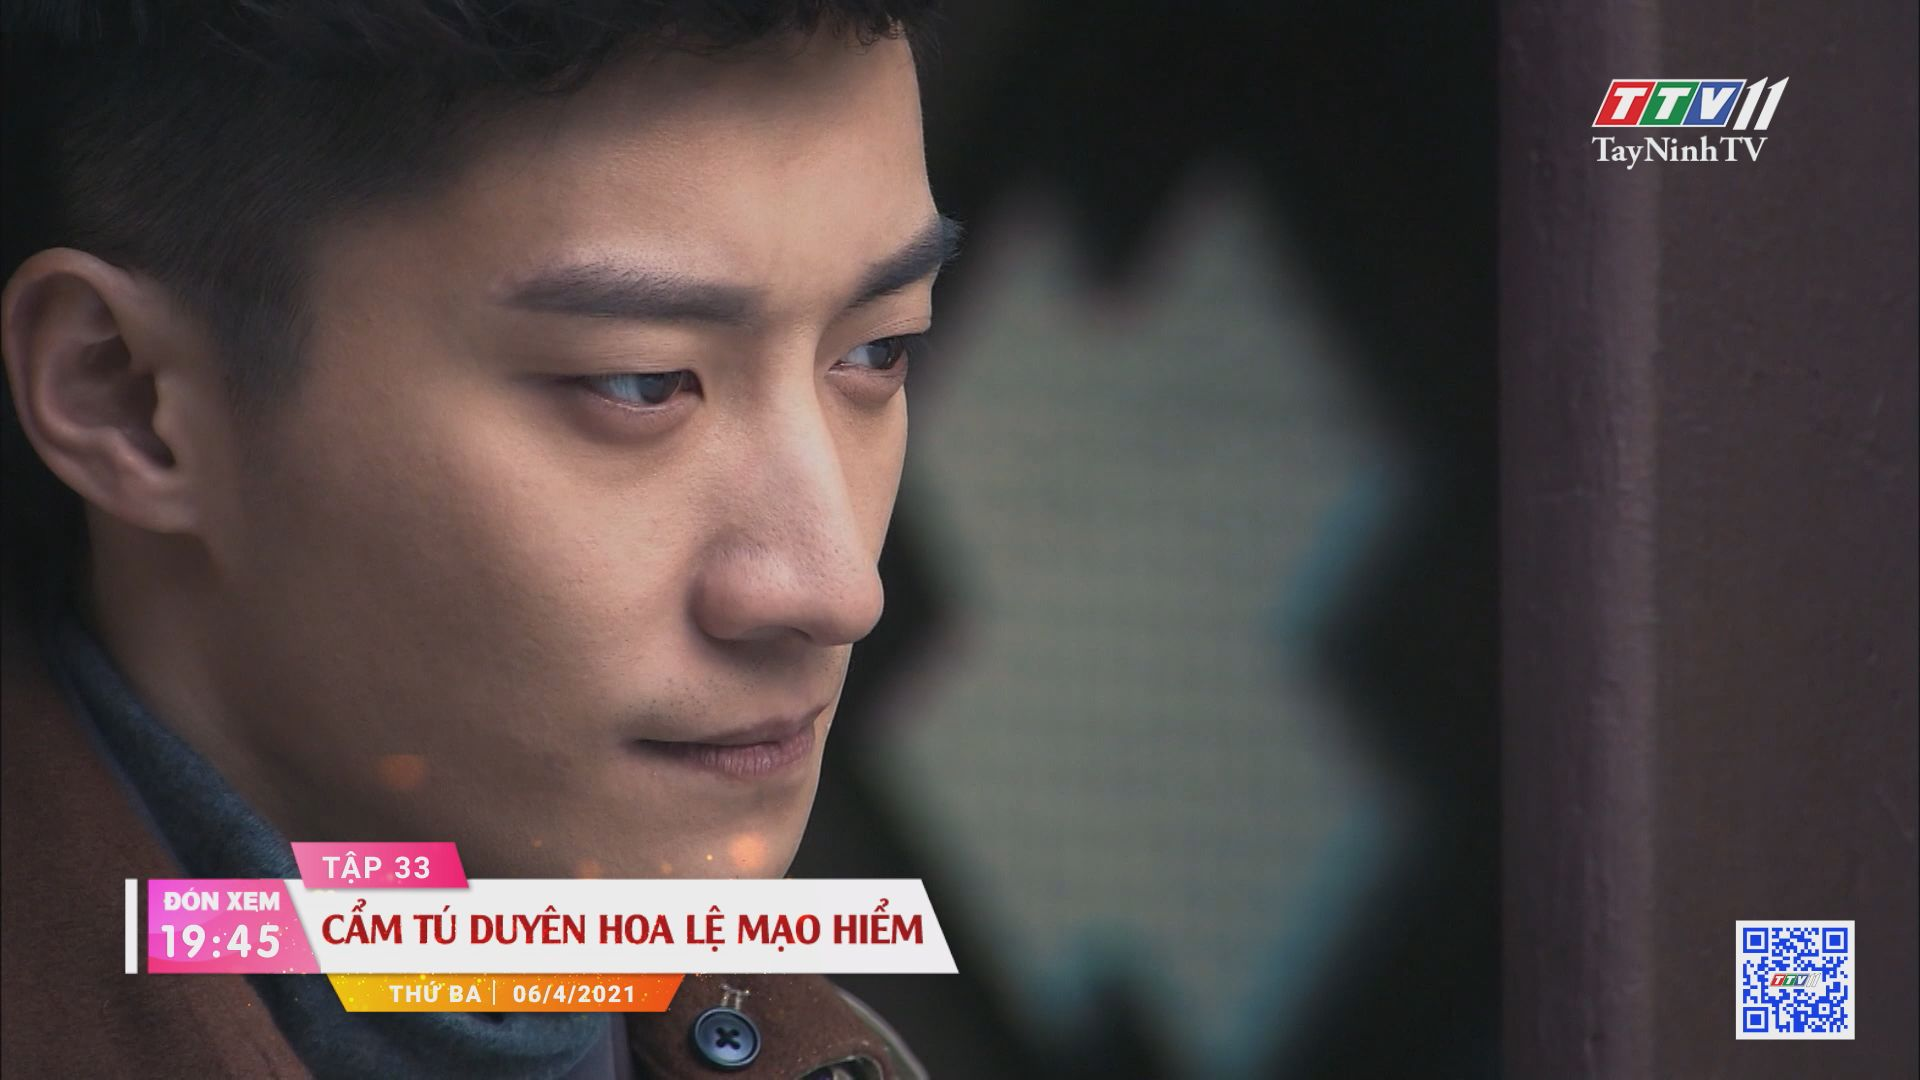 Cẩm Tú duyên hoa lệ mạo hiểm-Trailer tập 33 | PHIM CẨM TÚ DUYÊN HOA LỆ MẠO HIỂM | TayNinhTVE